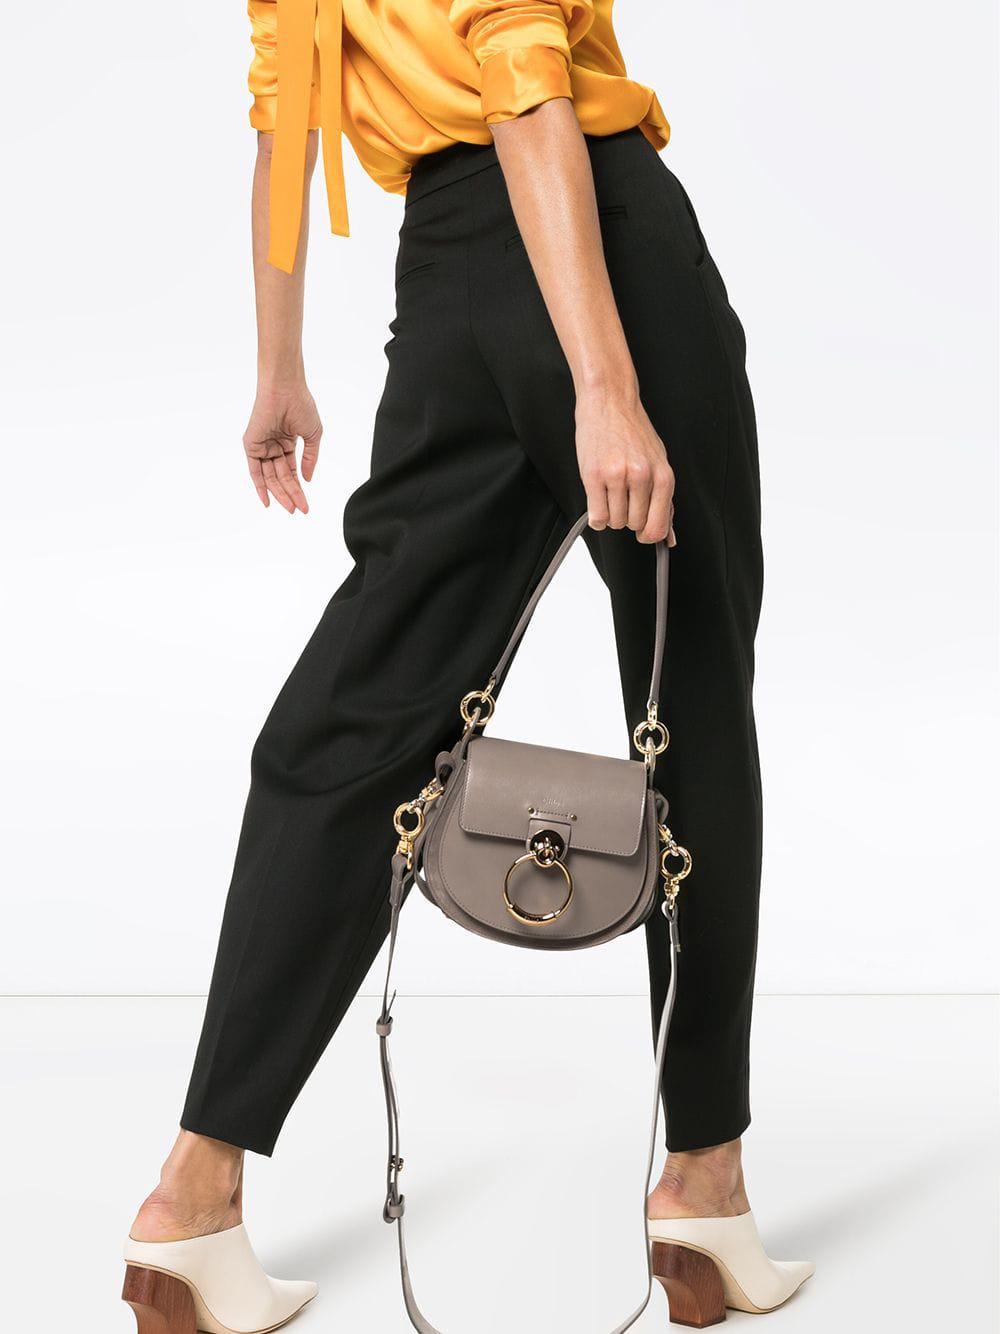 Lyst - Chloé Grey Tess Leather Shoulder Bag in Gray ab33223275